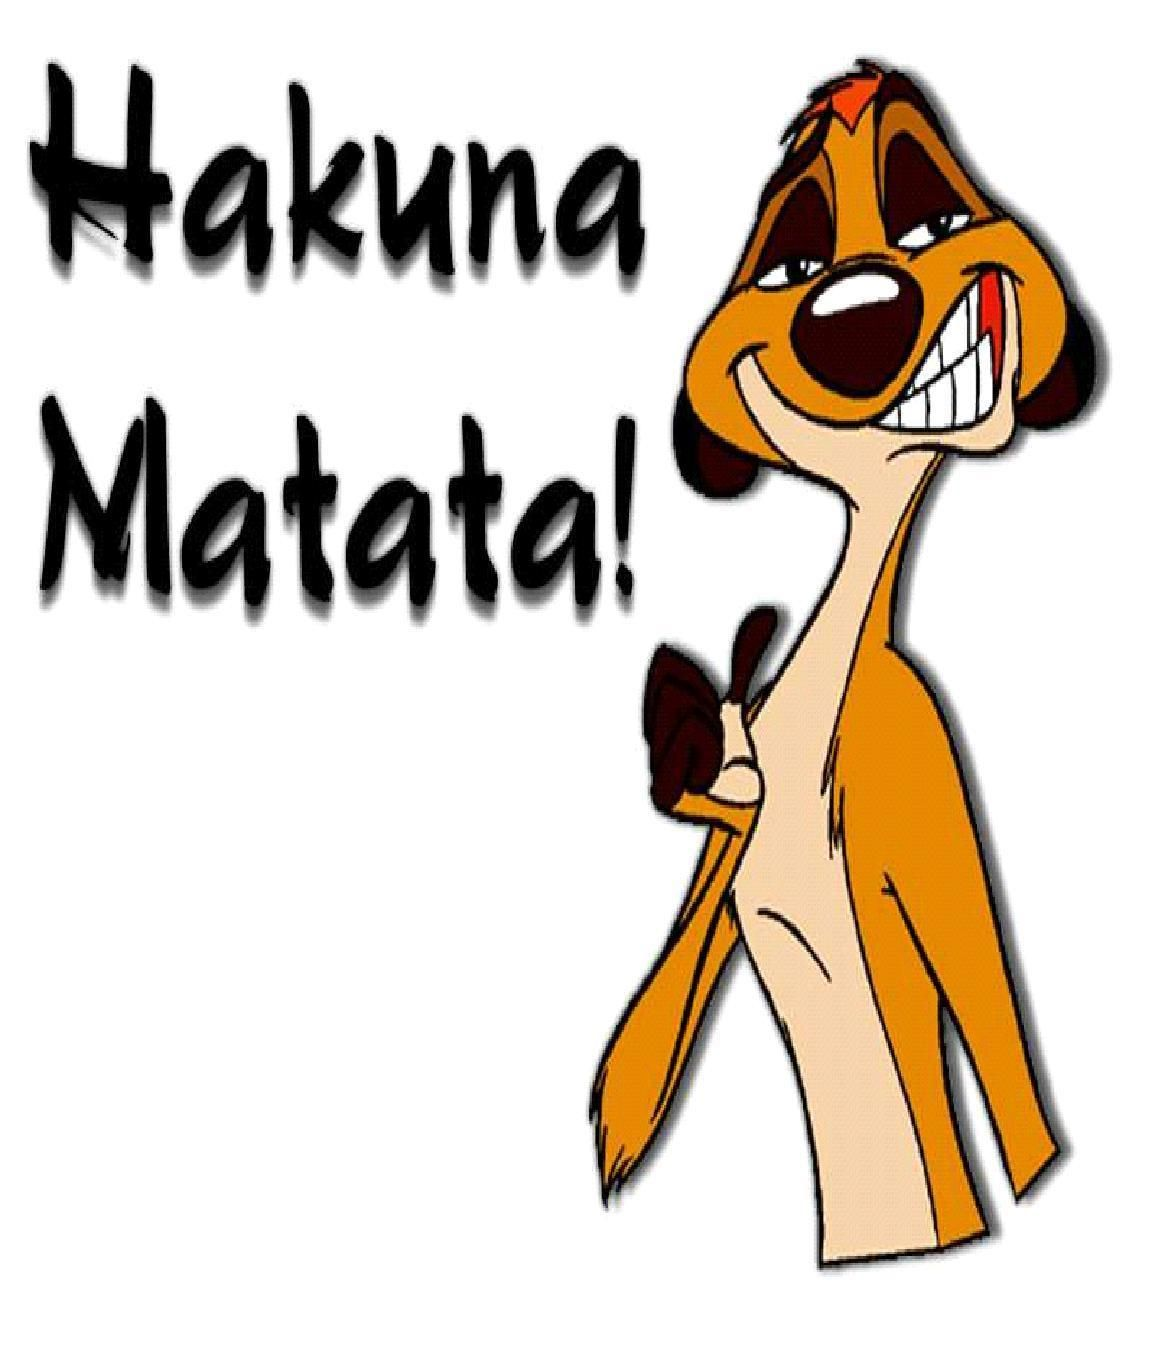 Timon And Pumba Fan Art Timon And Pumba Hakuna Matata Funny Day Quotes Hakuna